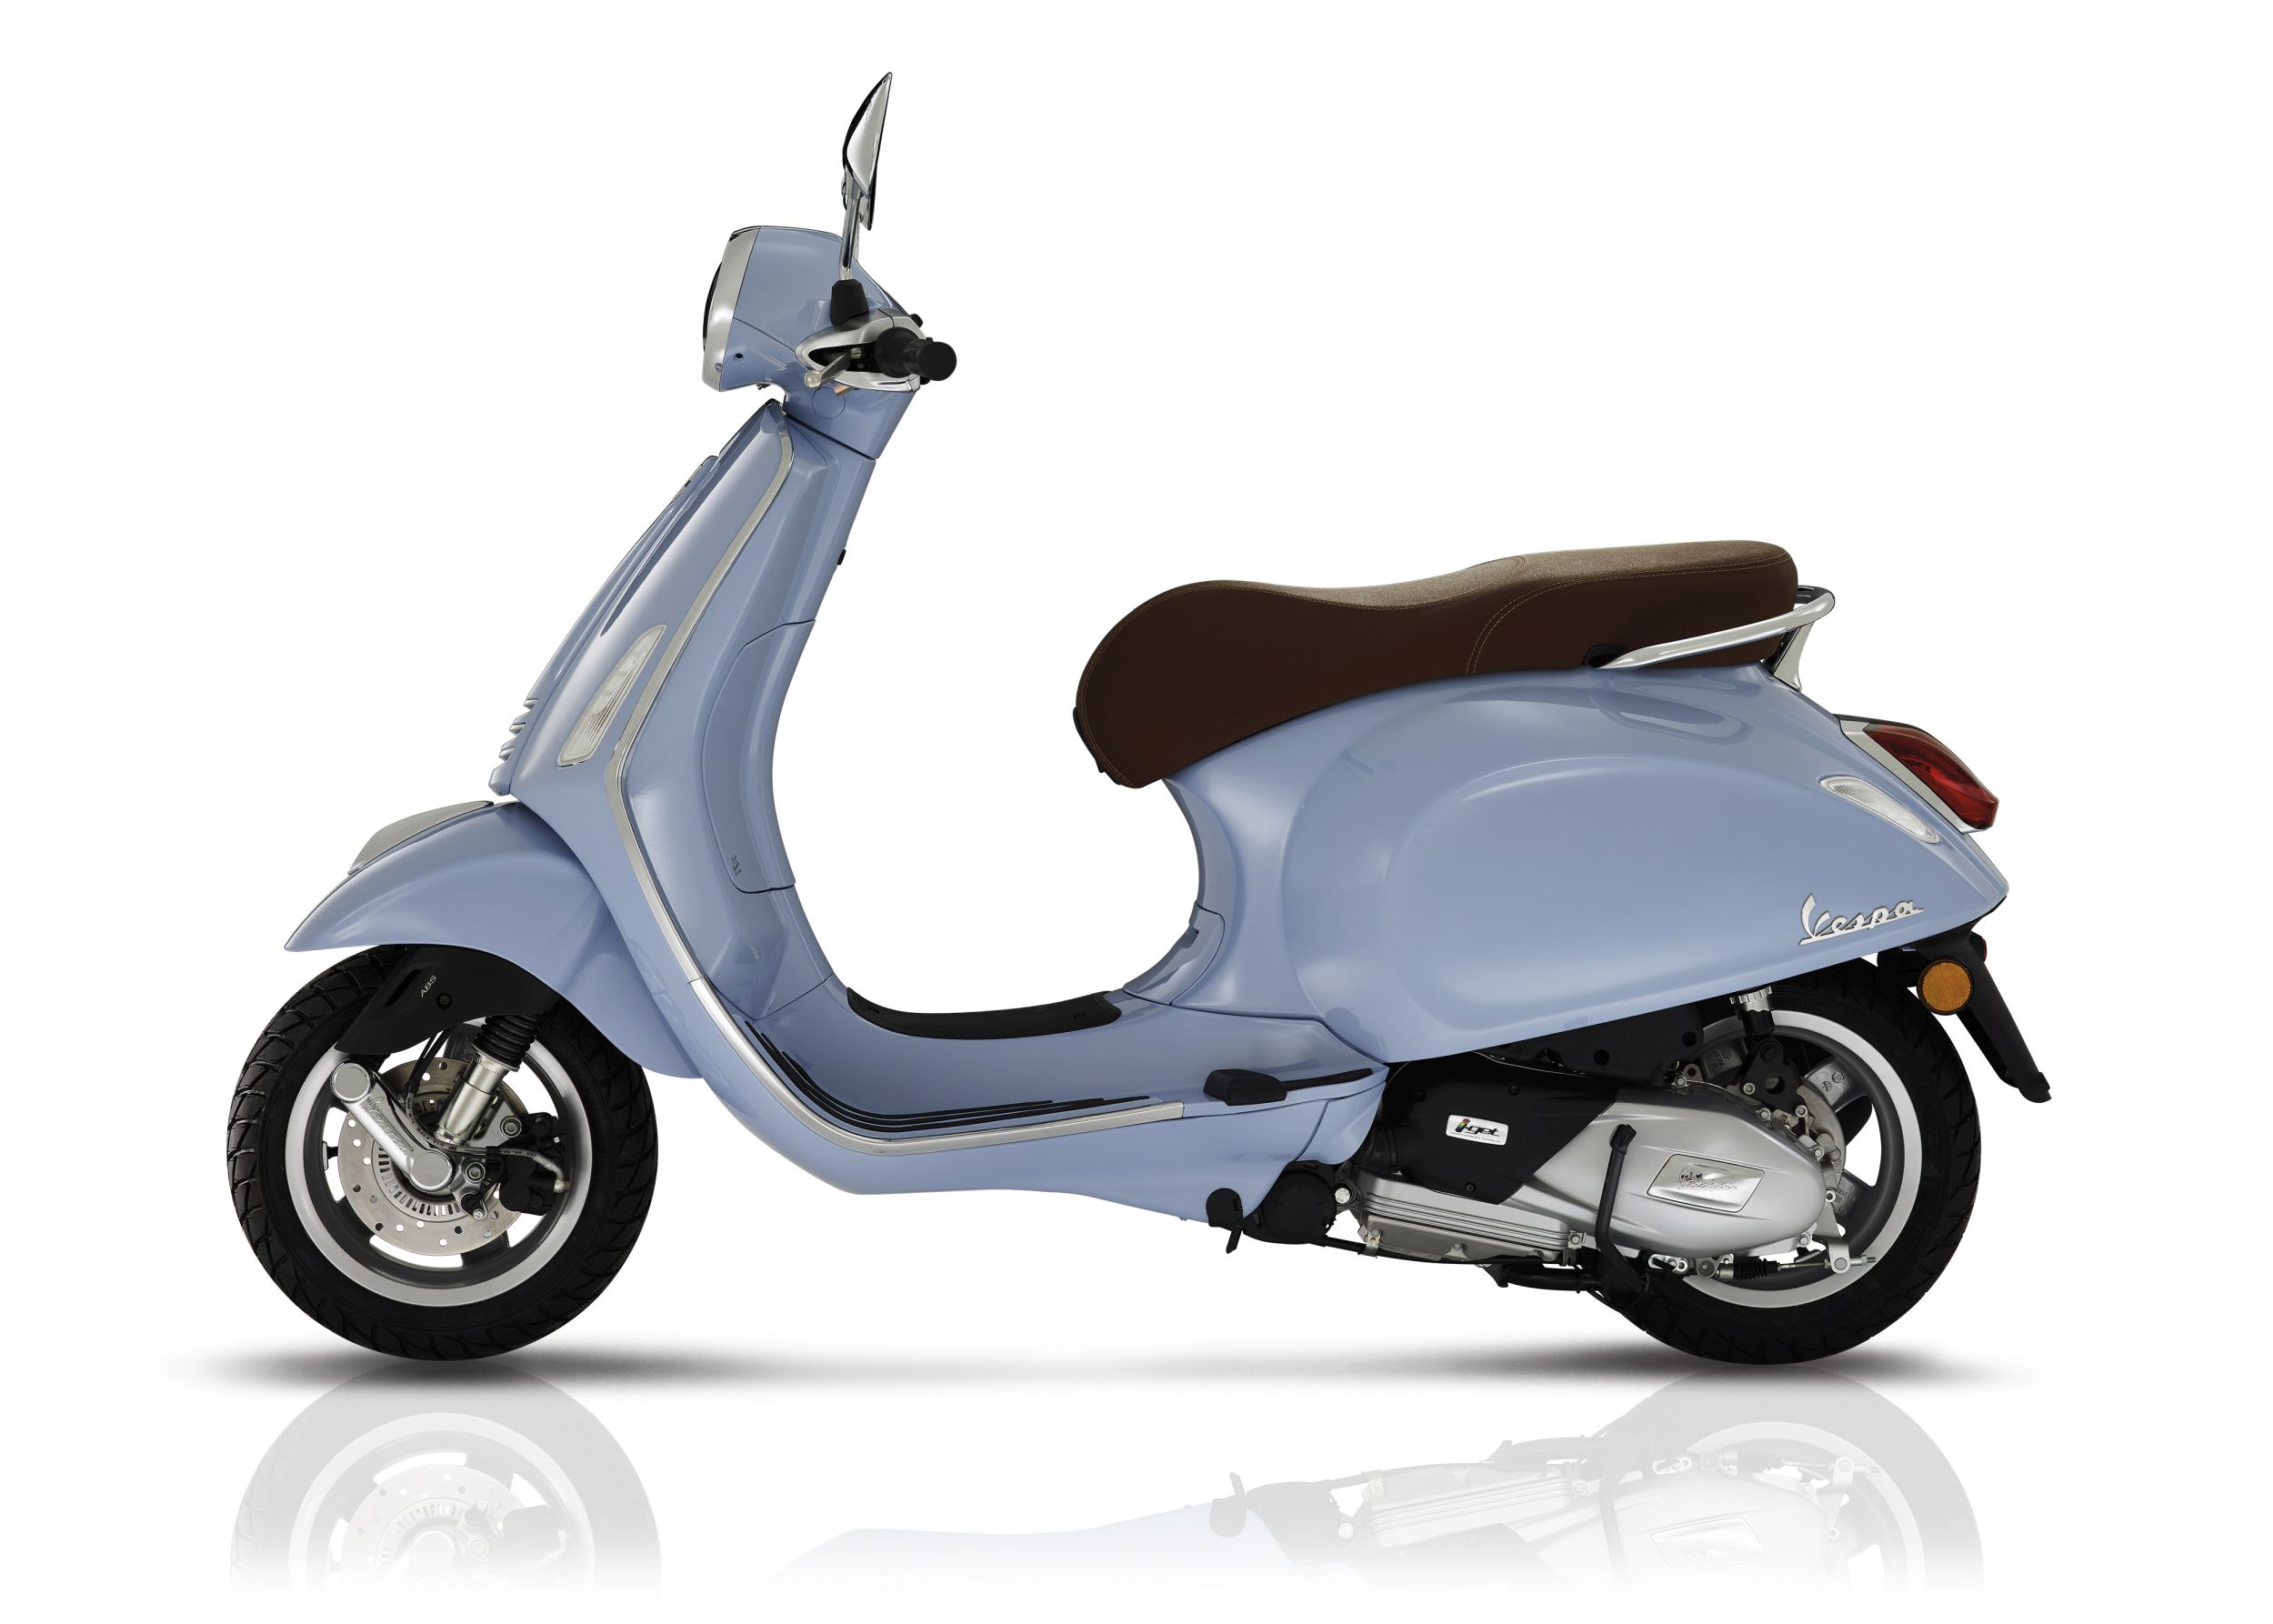 vespa modelle motorrad wiko motorrad gmbh 44147. Black Bedroom Furniture Sets. Home Design Ideas